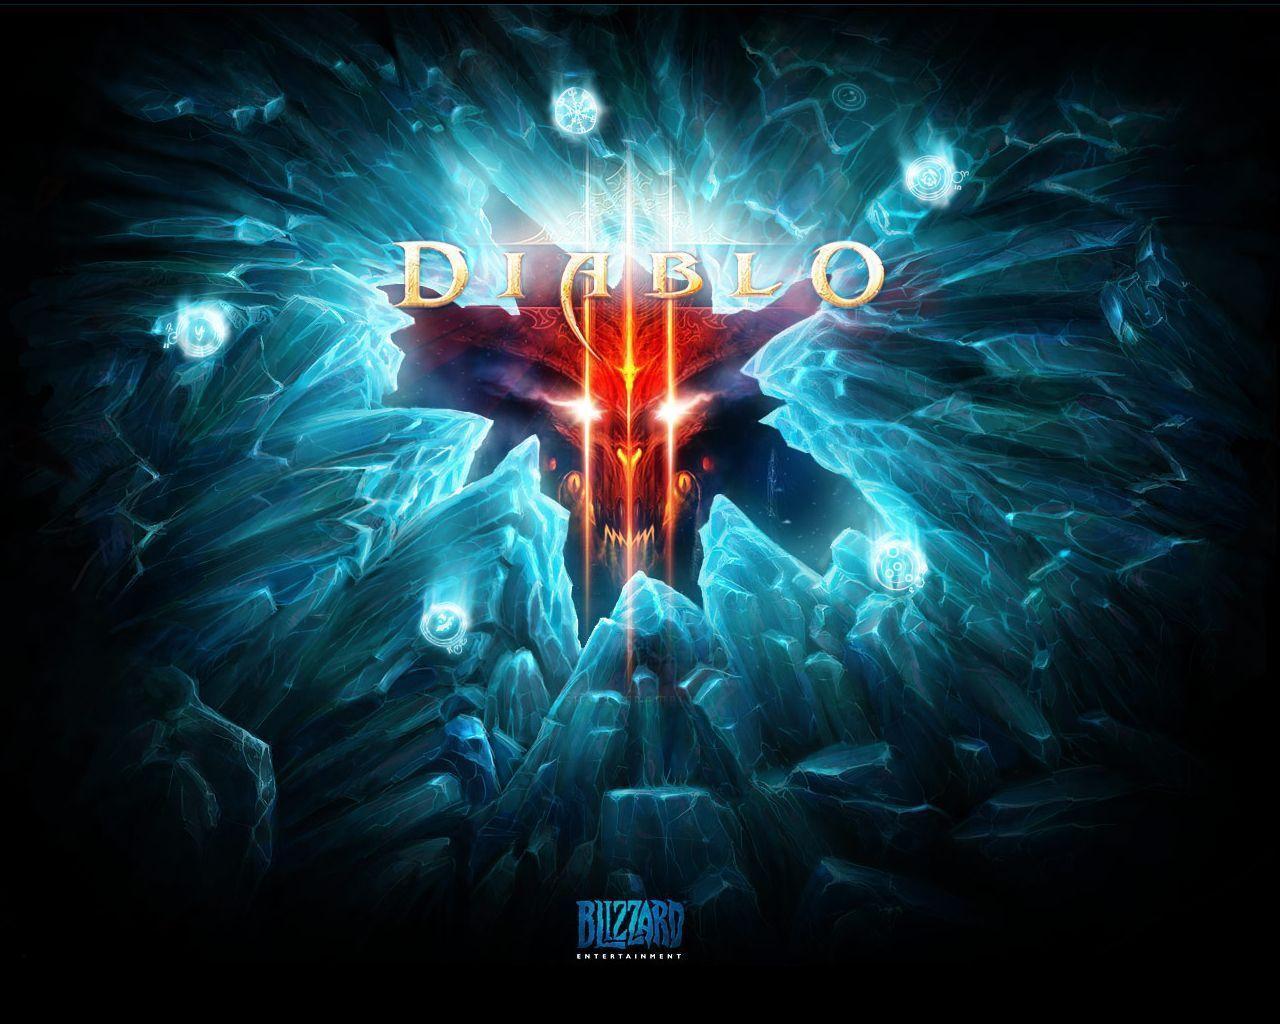 Diablo 3 Wallpaper - HD Wallpapers Download